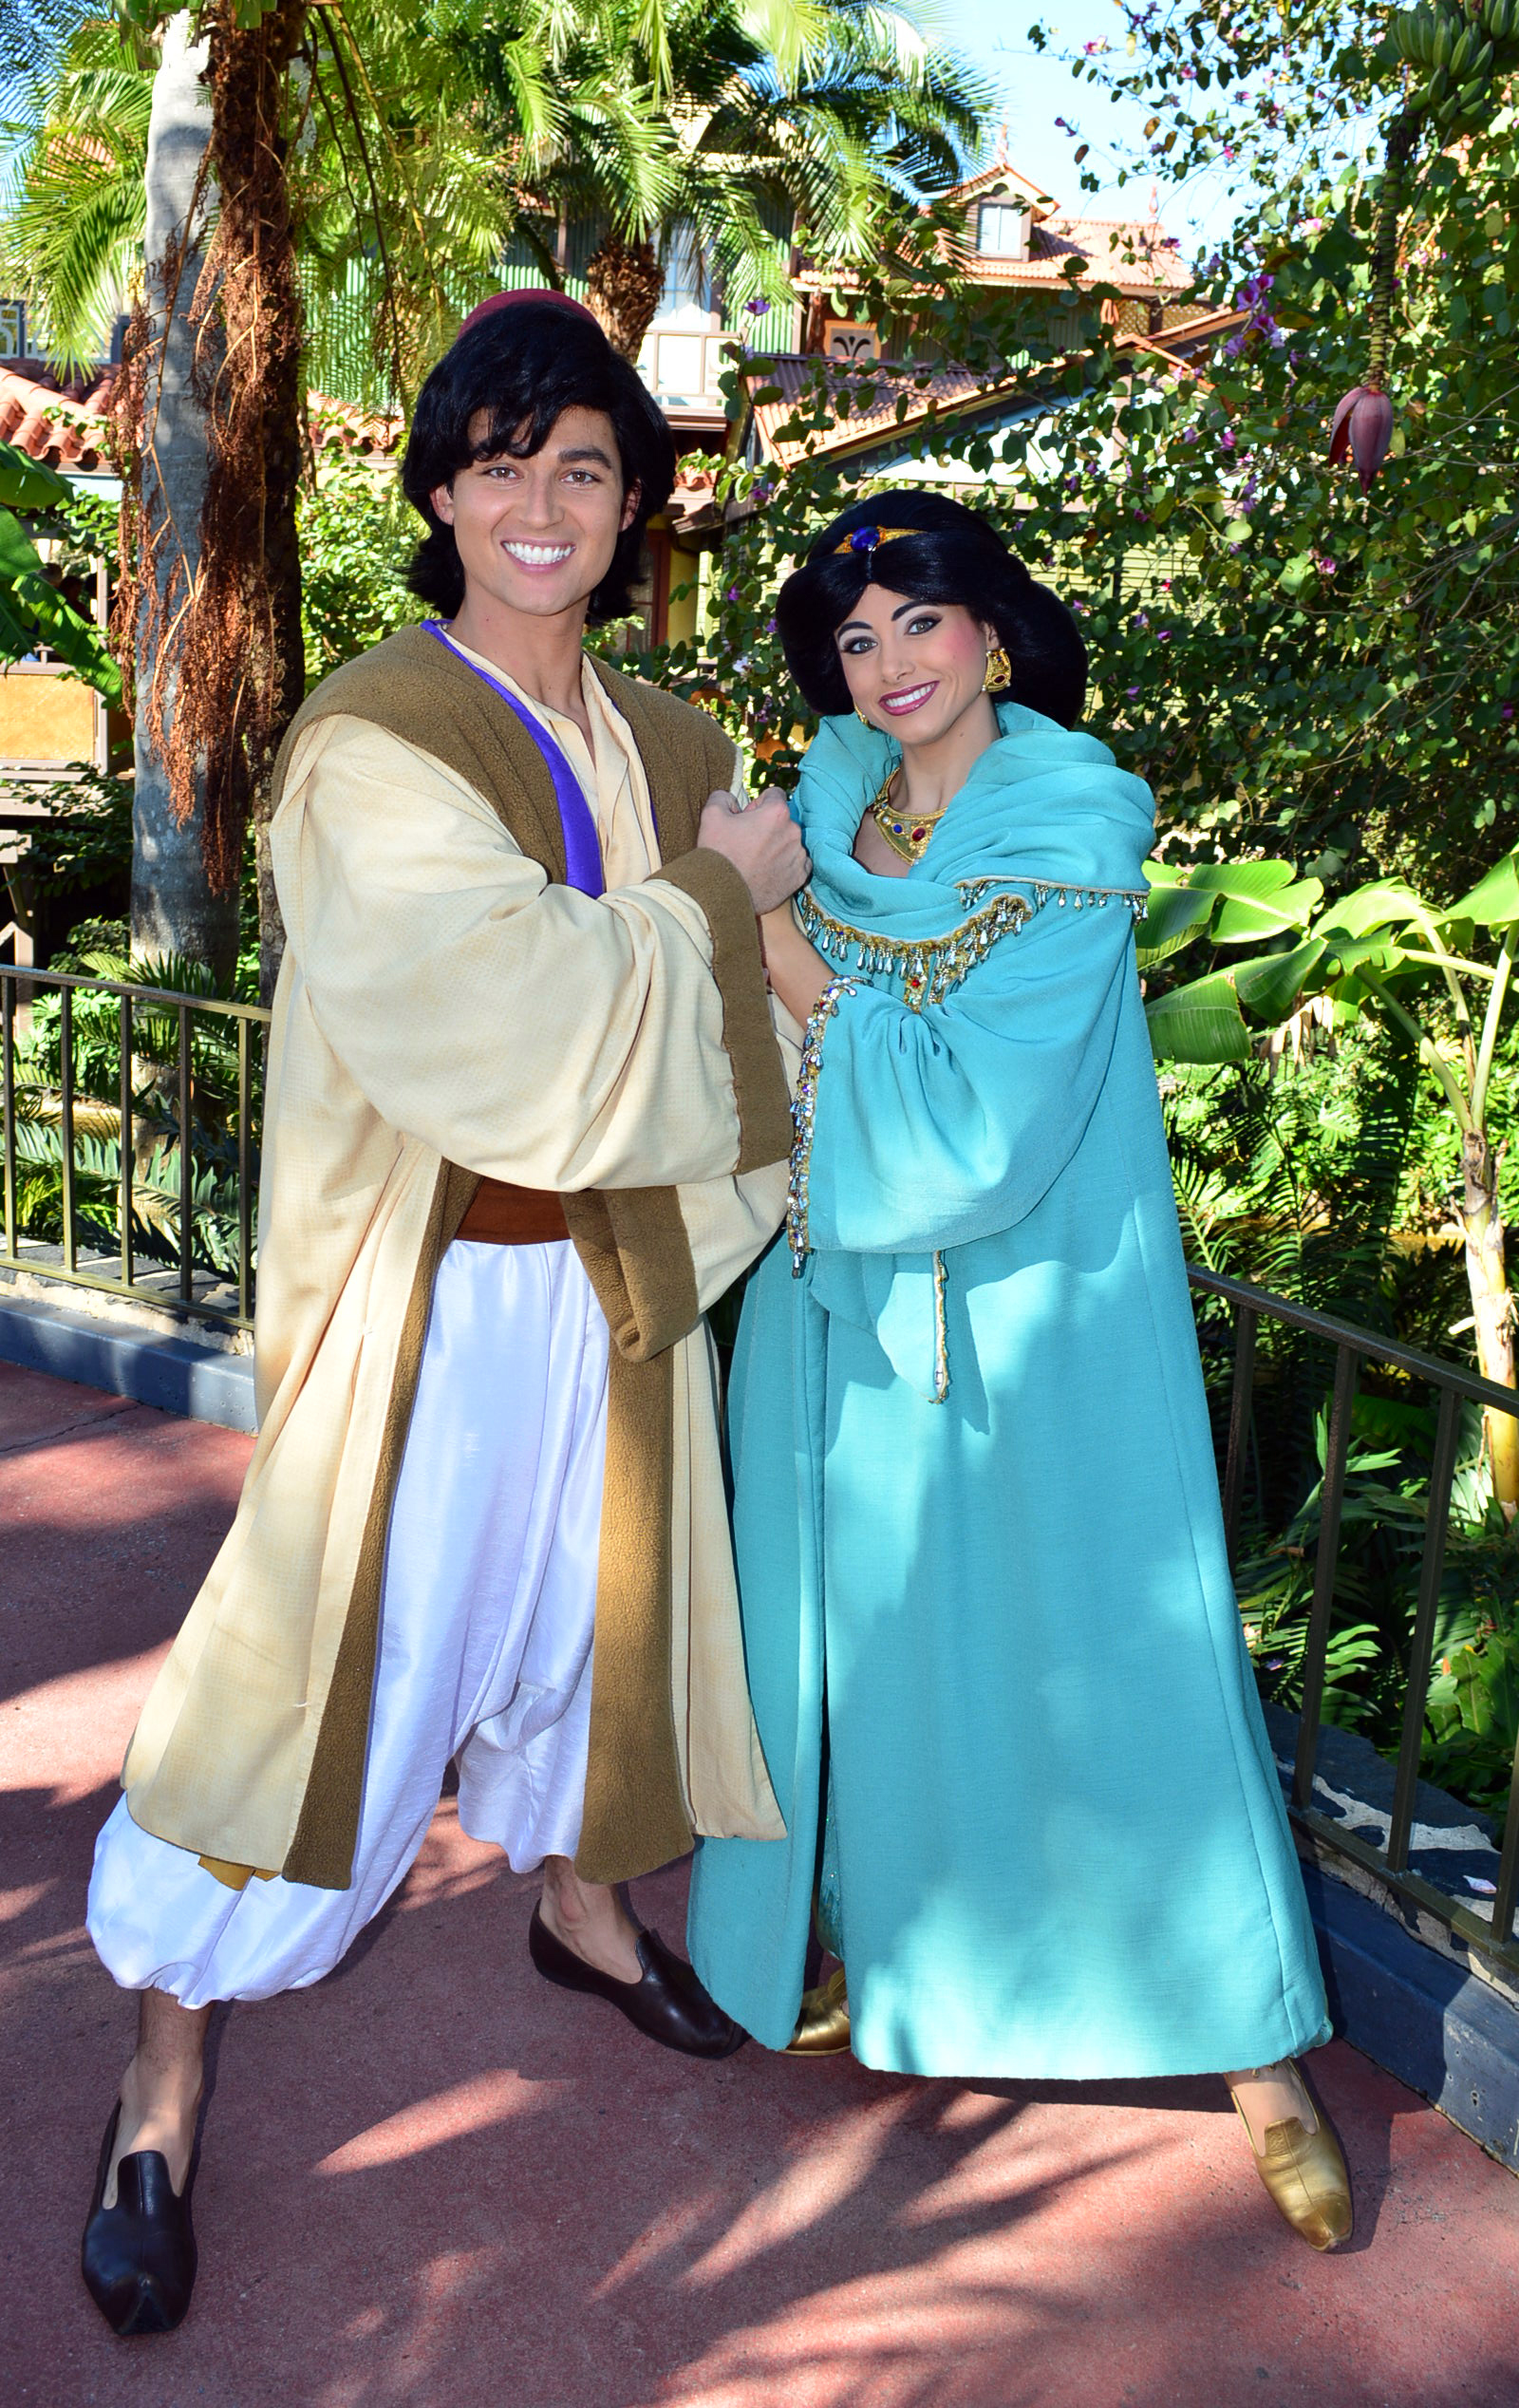 Disney World Character Meet And Greet Magic Kingdom